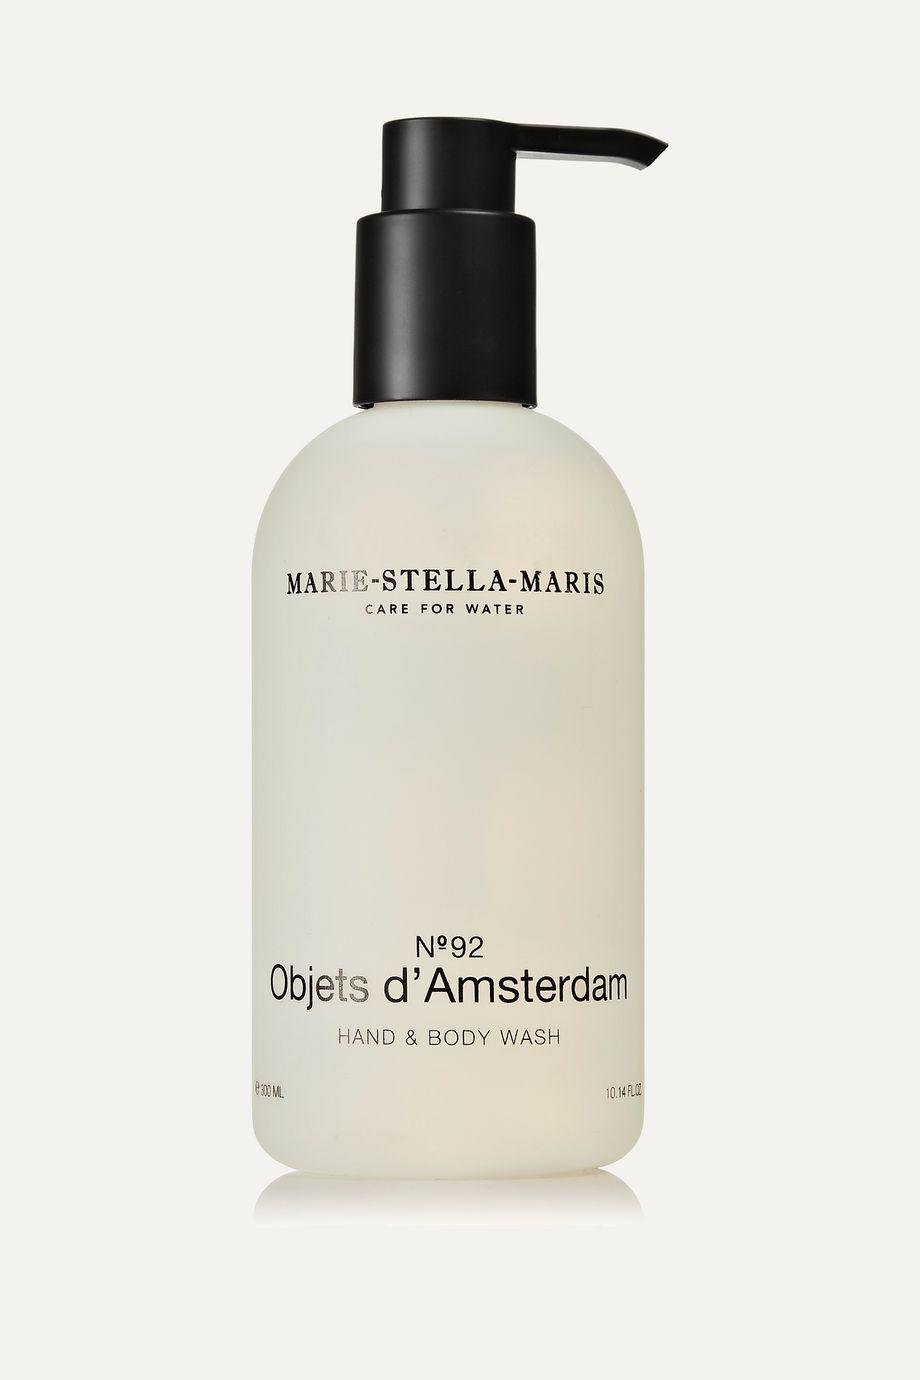 Marie-Stella-Maris Hand & Body Wash – Objets d'Amsterdam, 300 ml – Flüssigseife